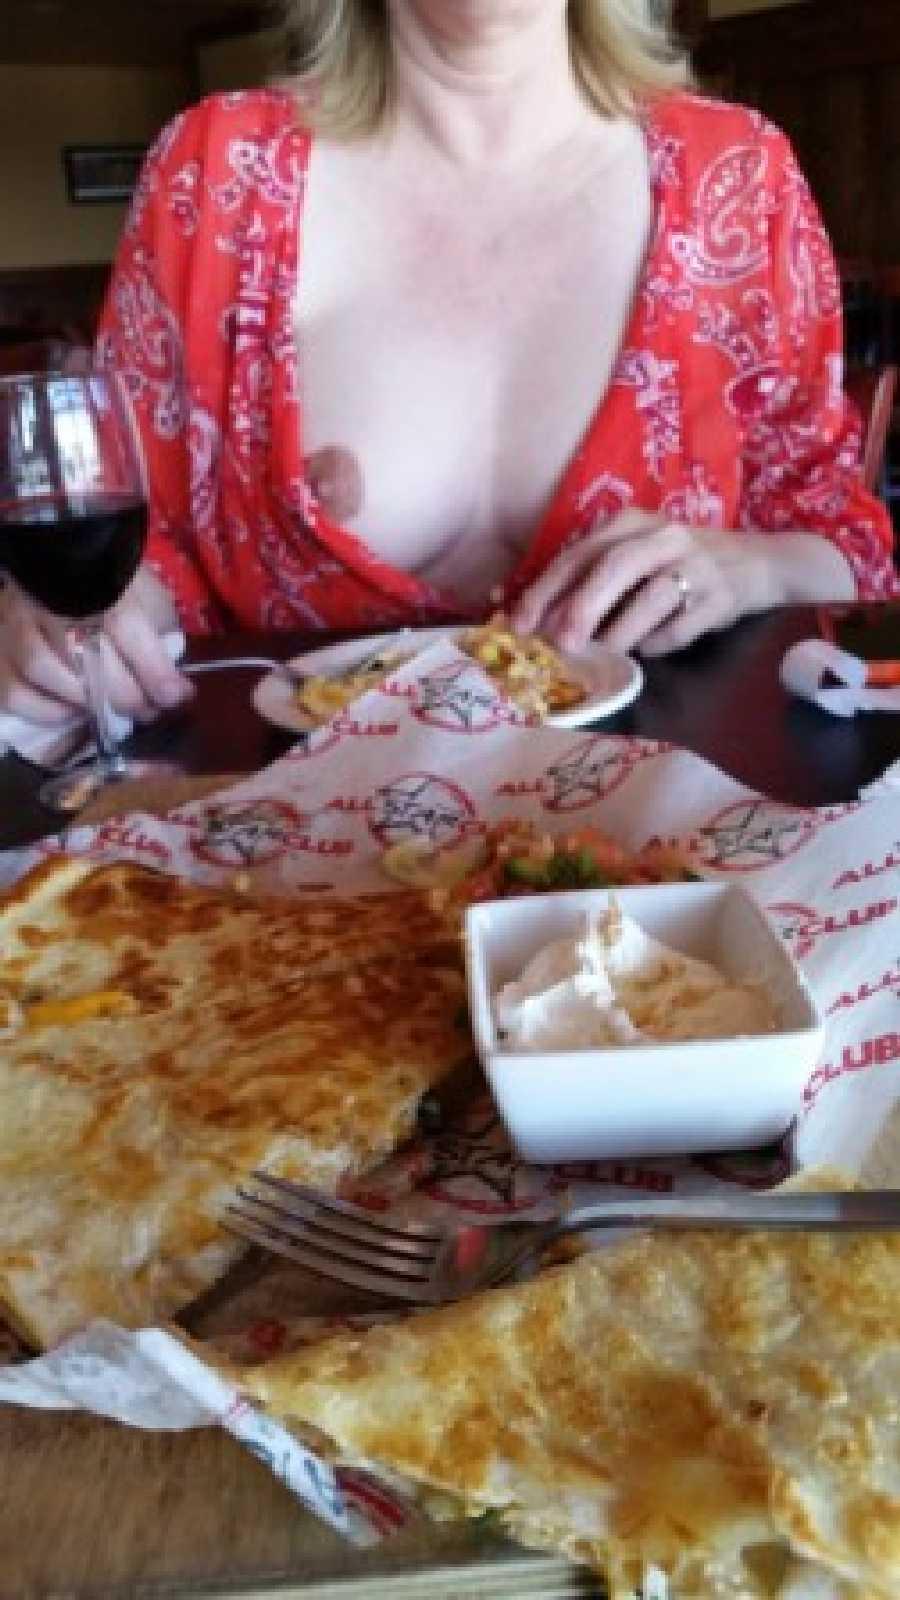 Nipple Exposed at Restaurant